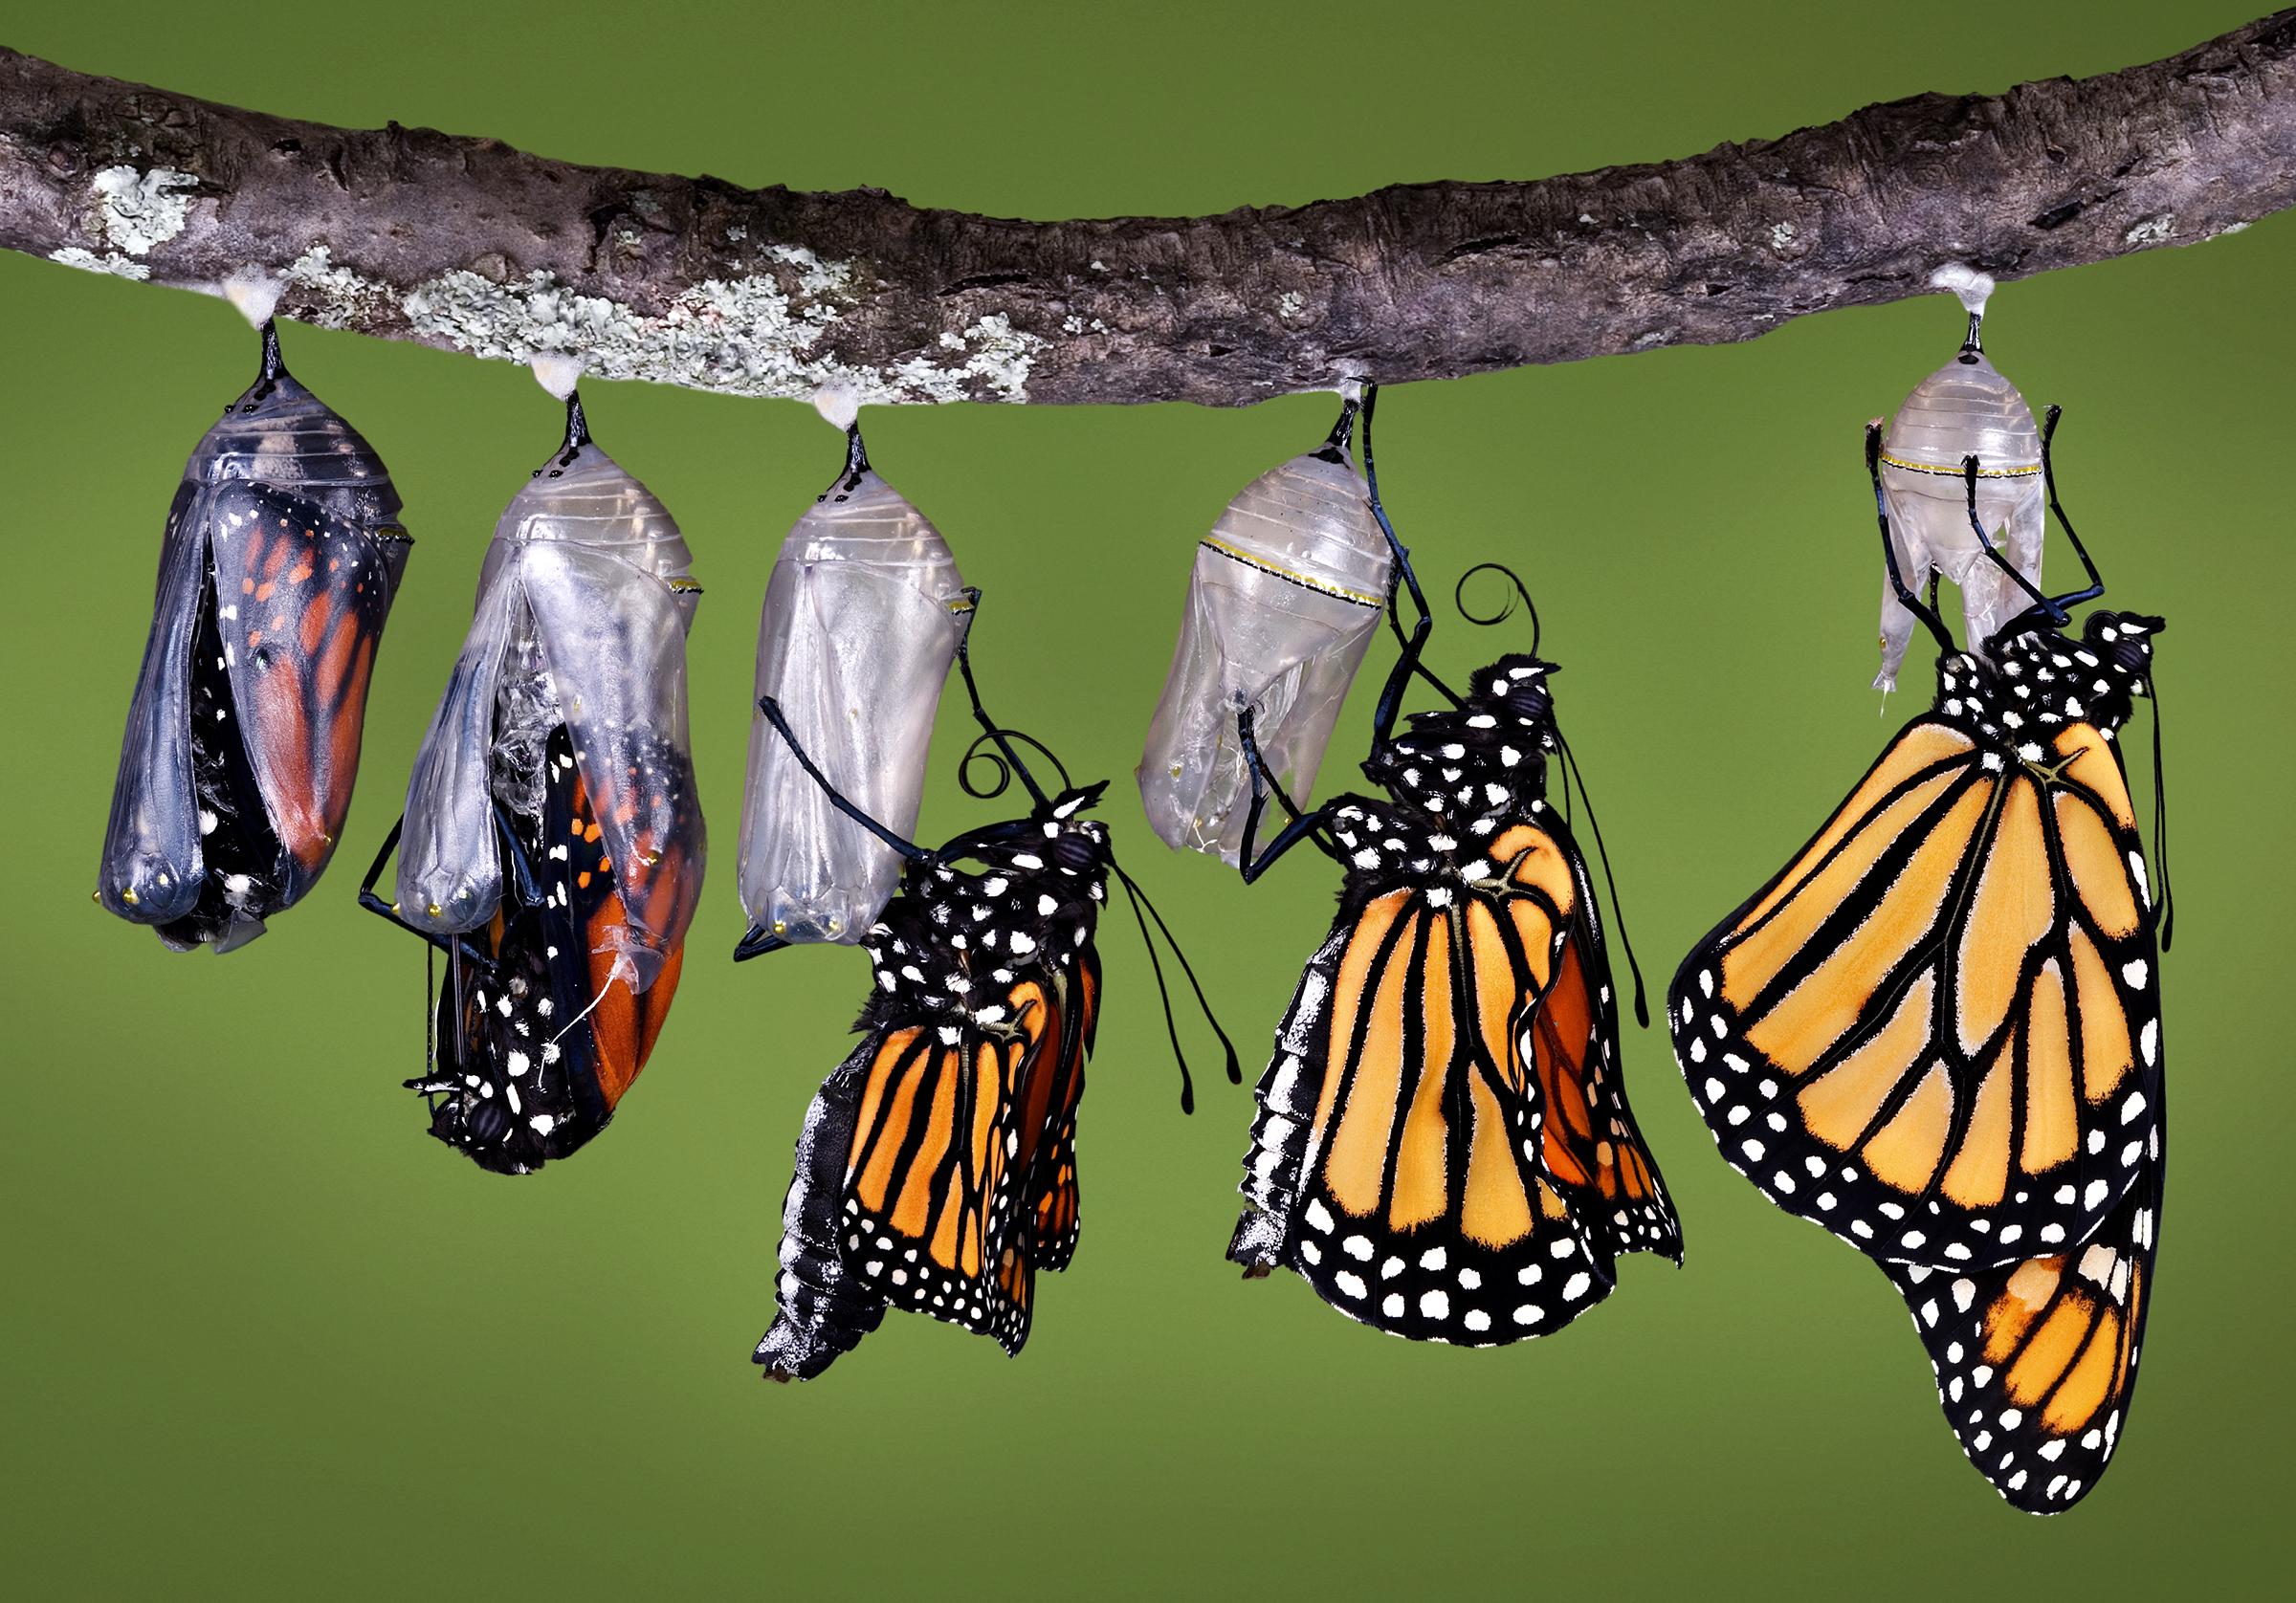 Viva Prana_Yoga_Bowspring_Wellness_Chicago_Blog_032918_Butterfly_1